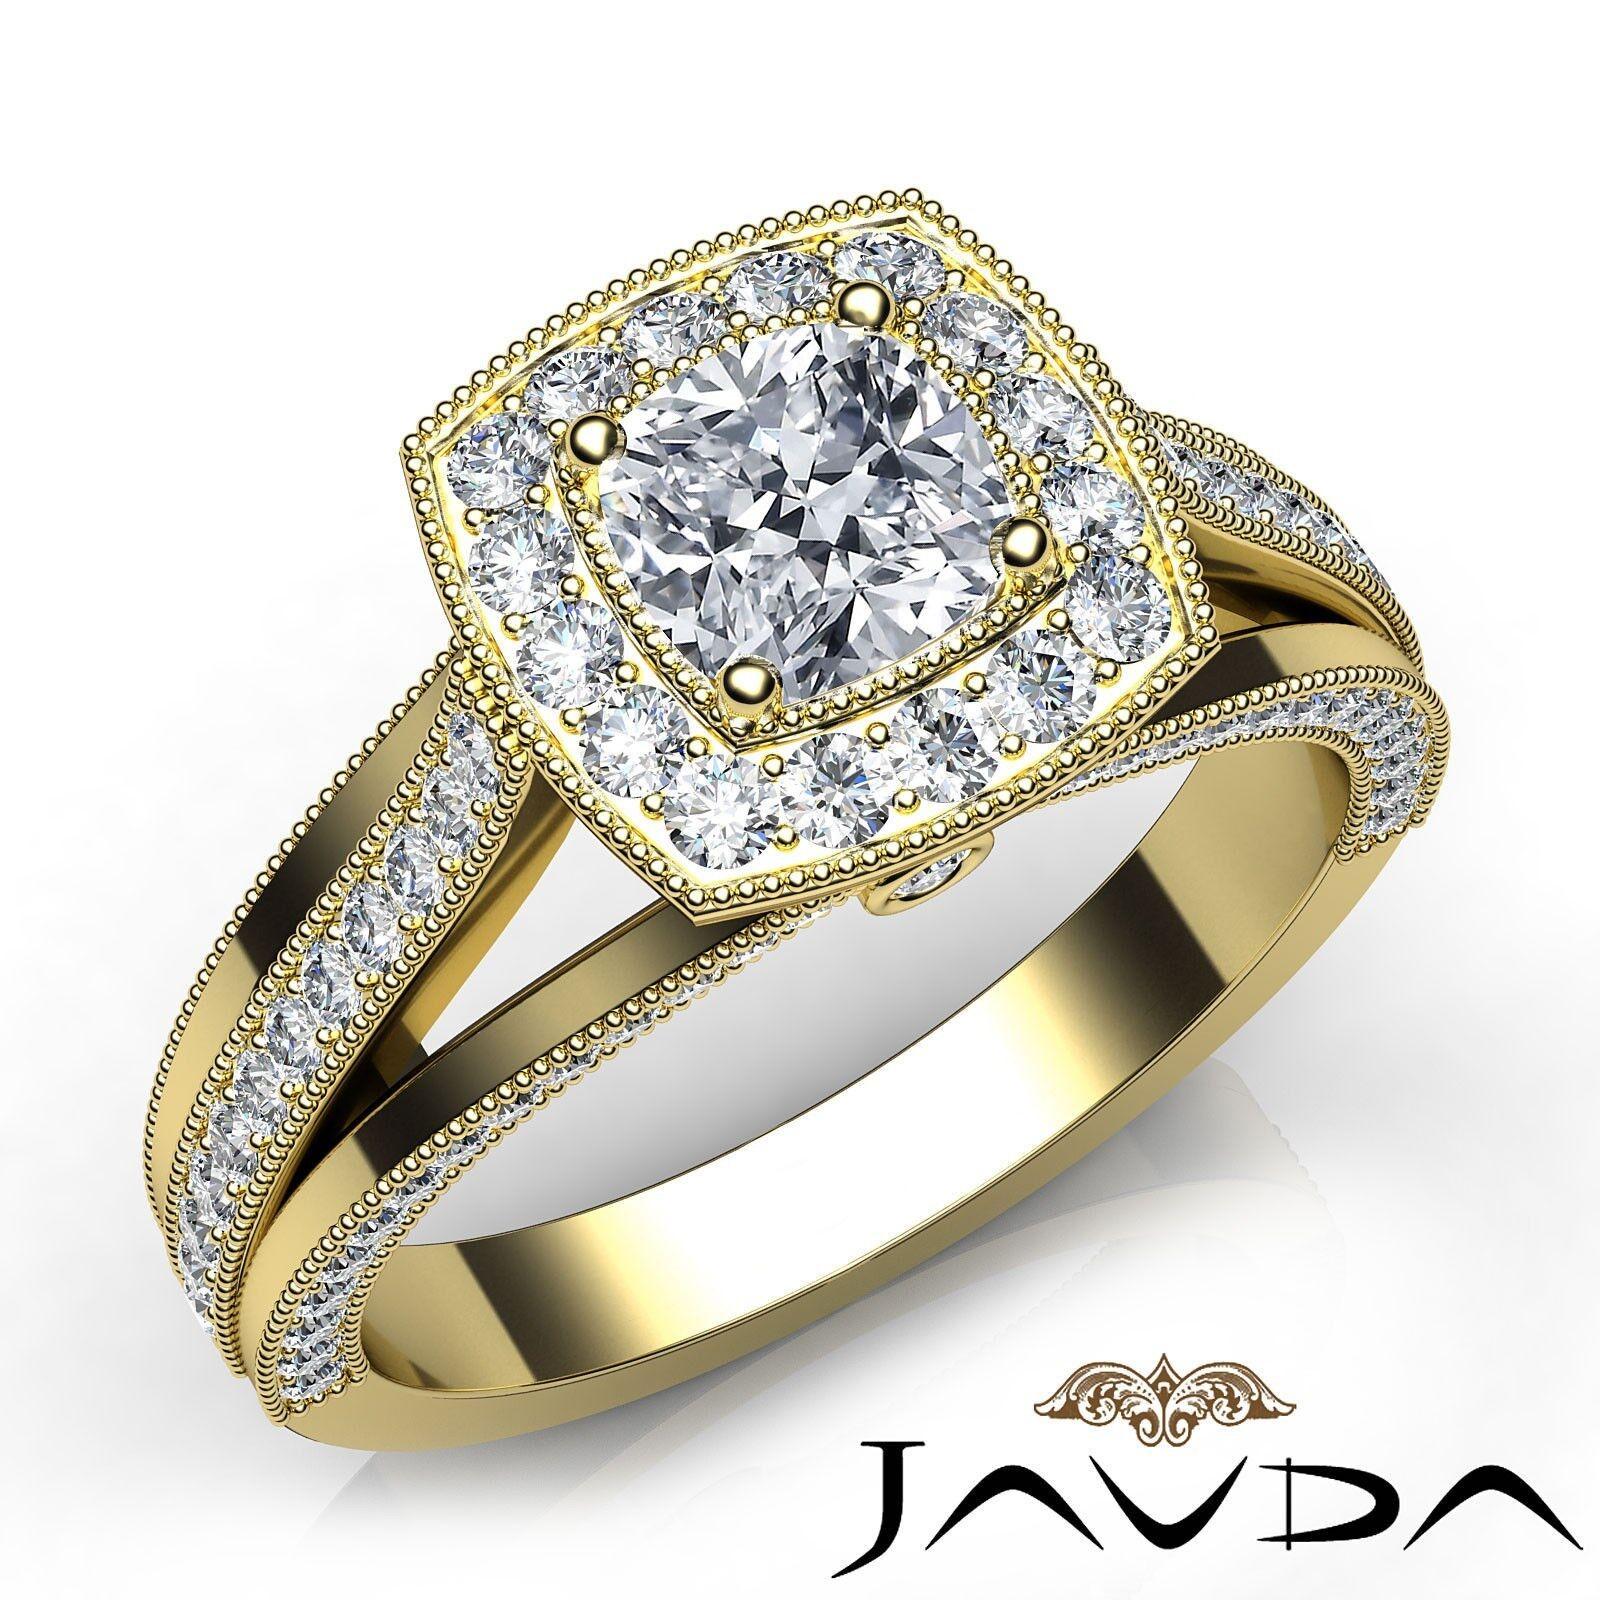 Cushion Cut Pave Set Diamond Engagement Ring GIA H VS1 18k Yellow Gold 1.40Ct